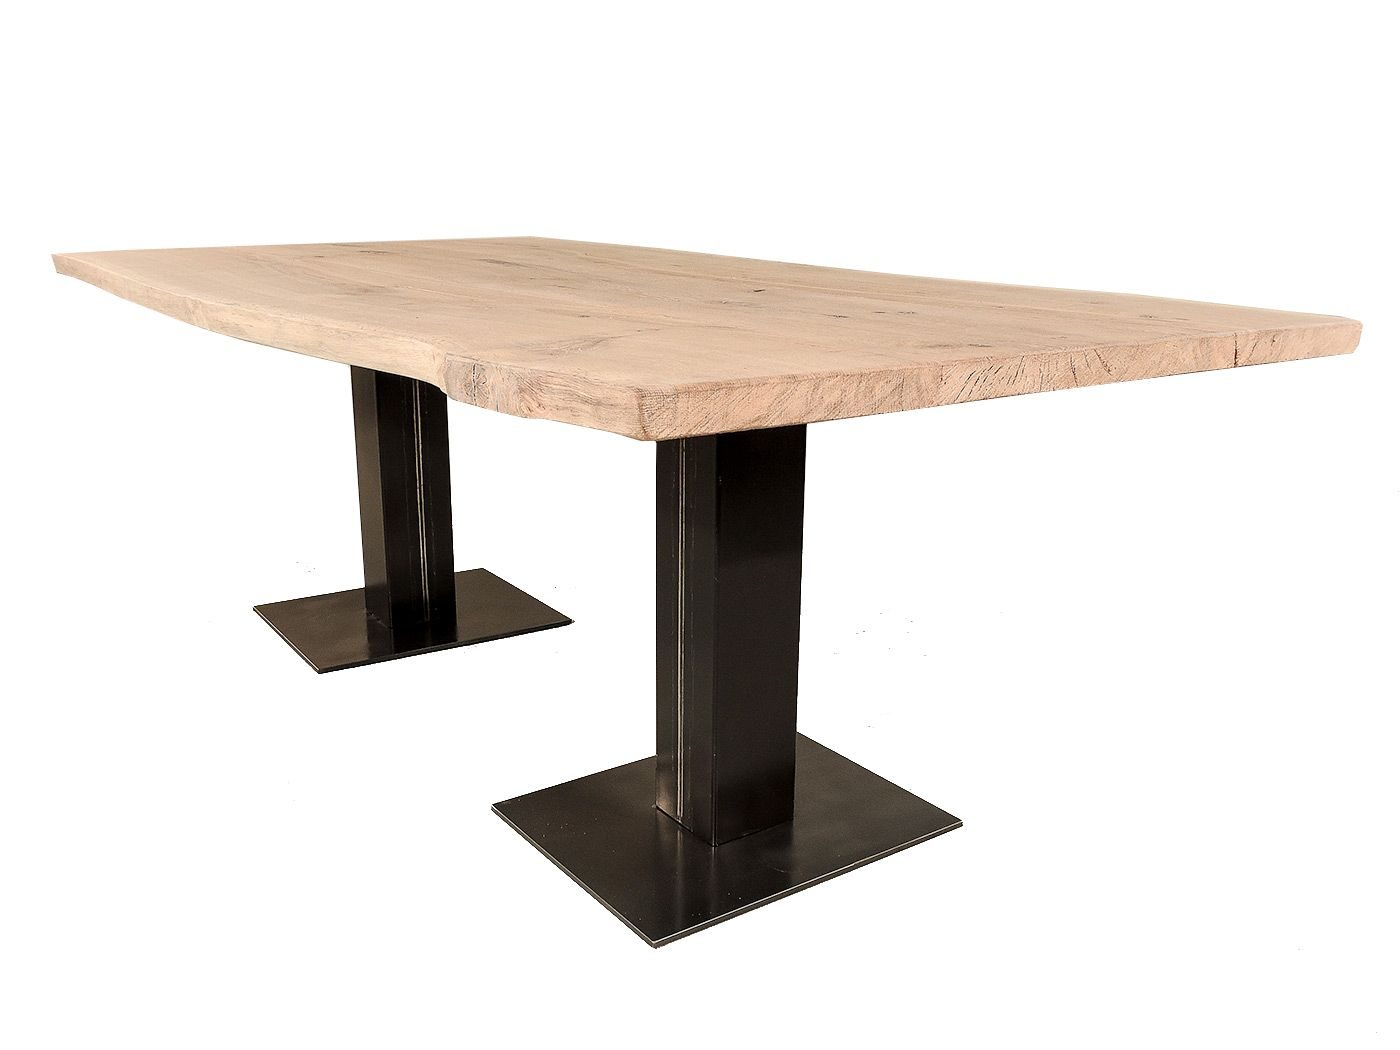 Boomstam eettafel   310cm, 150cm breed   plataan hout   massief ...